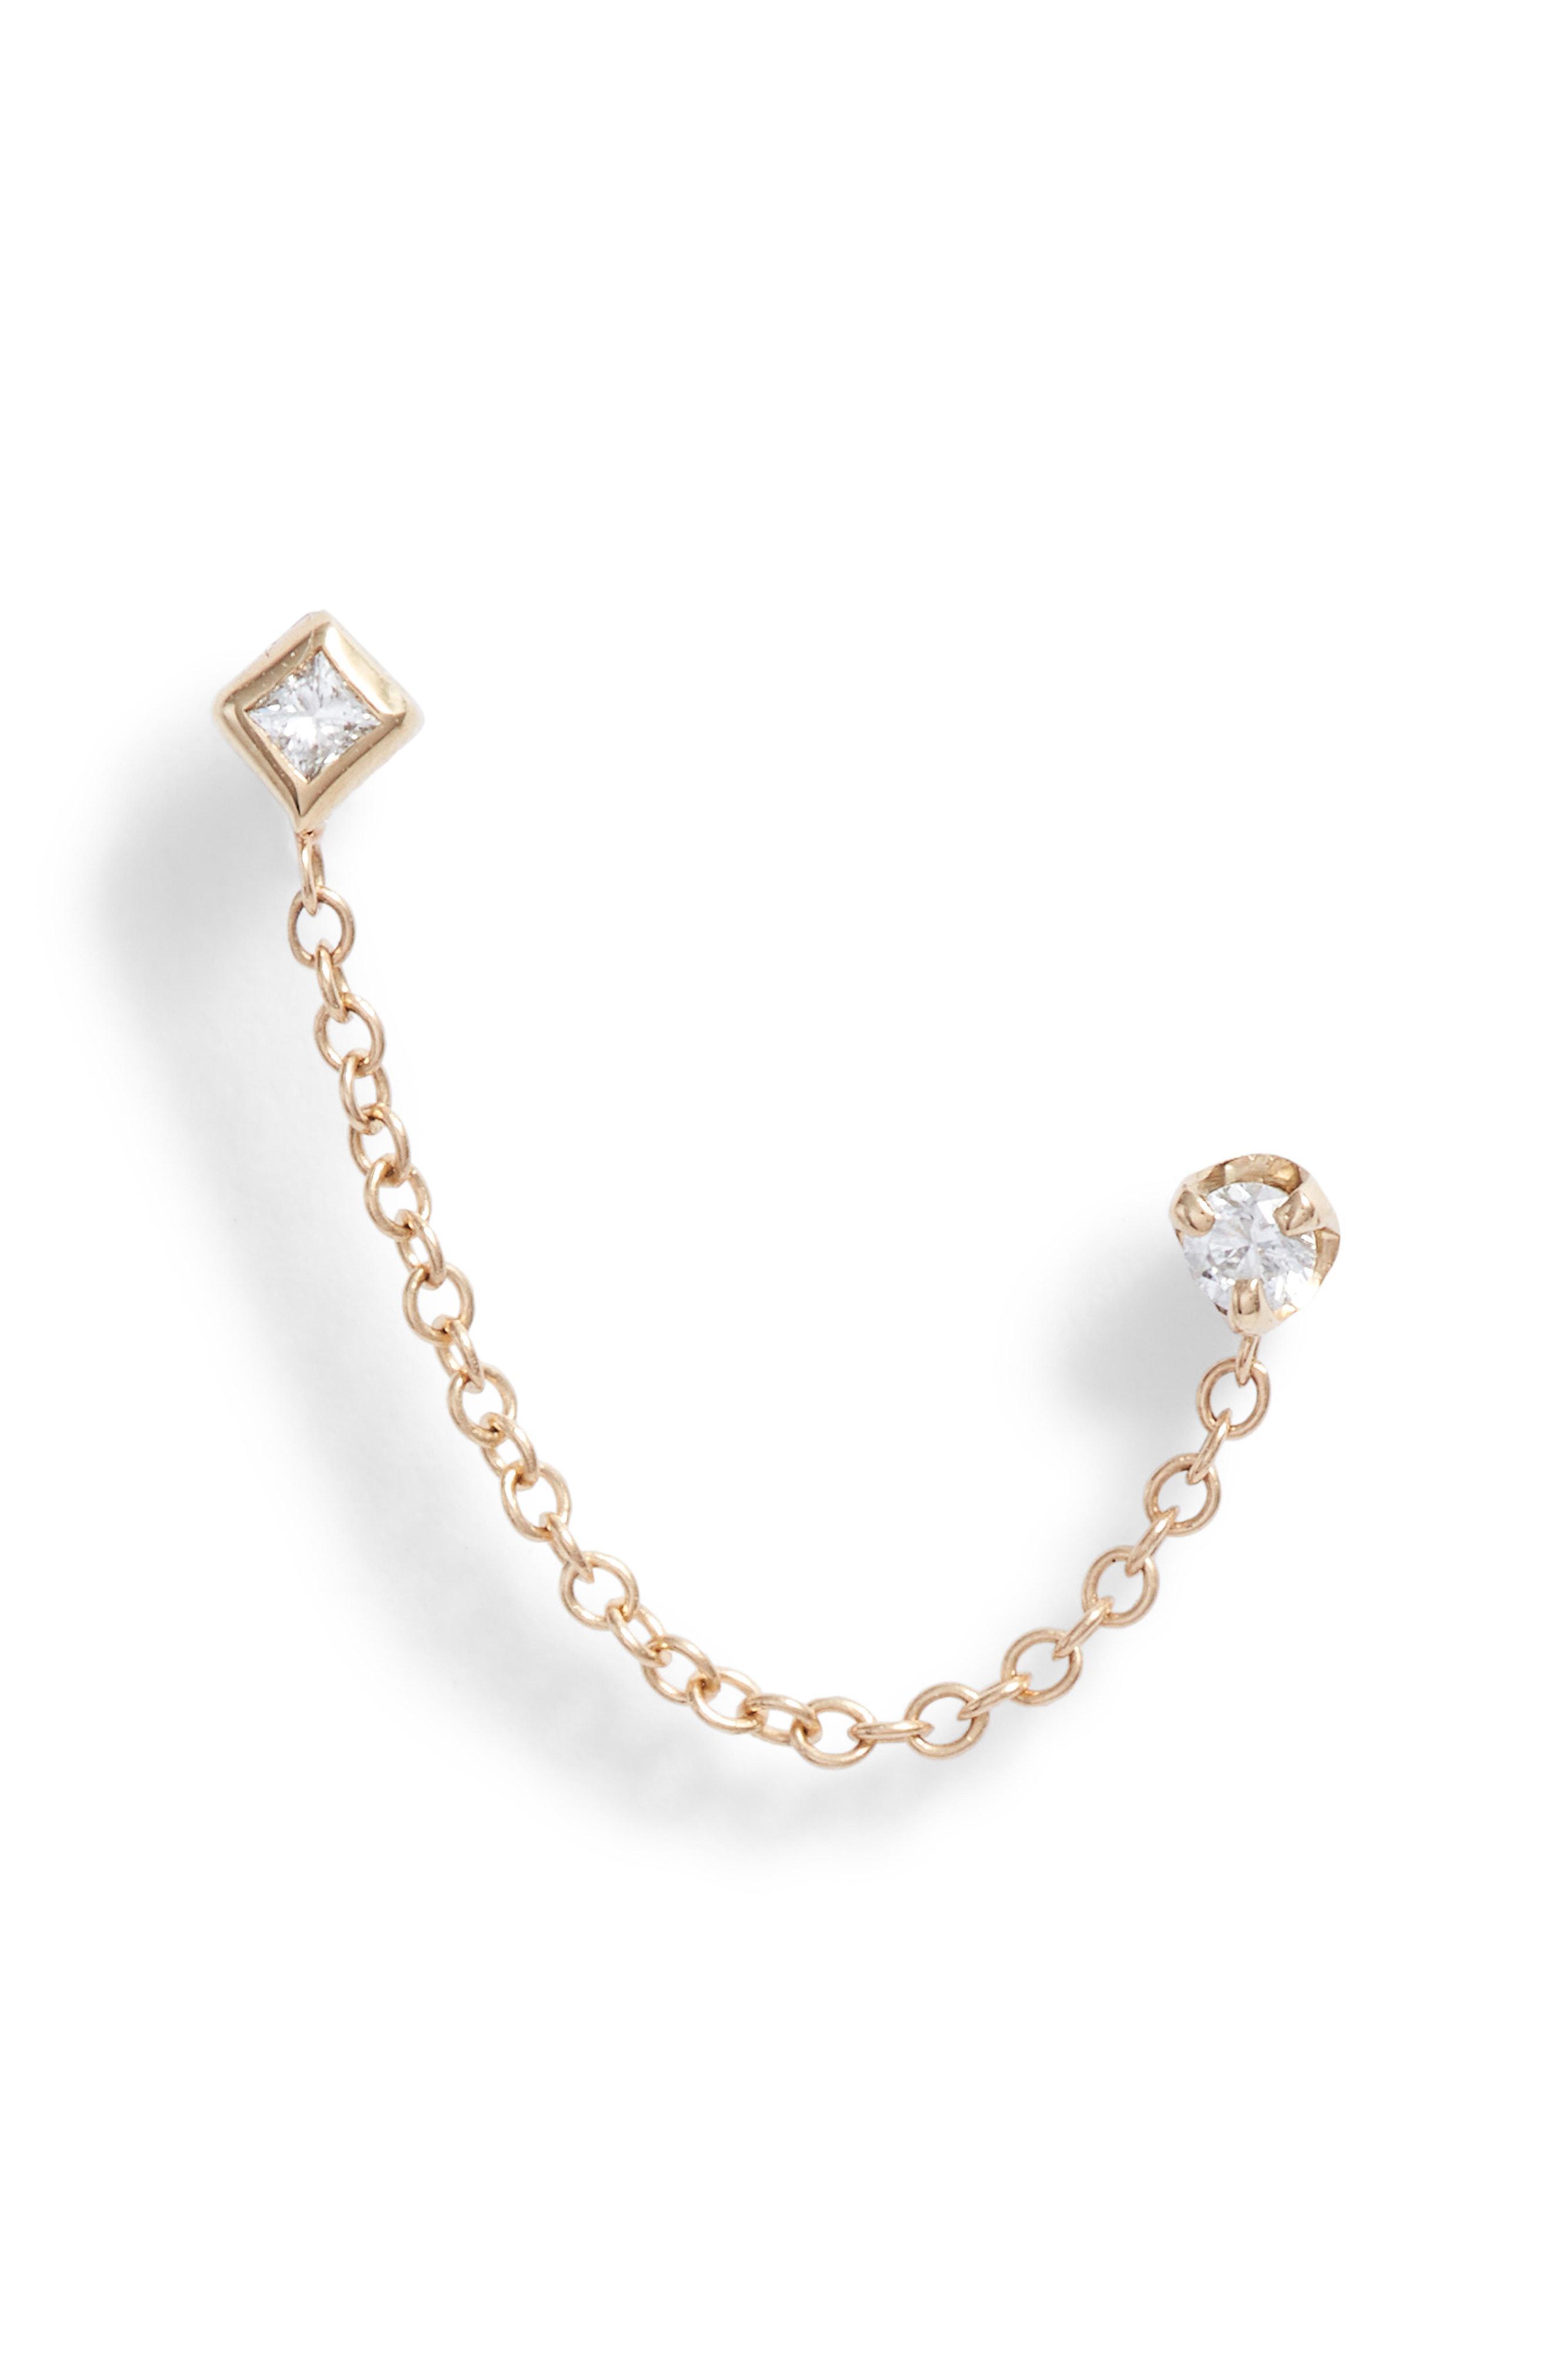 ad19bb56d3 Lyst - Zoe Chicco Diamond Chain Stud Earring in Metallic